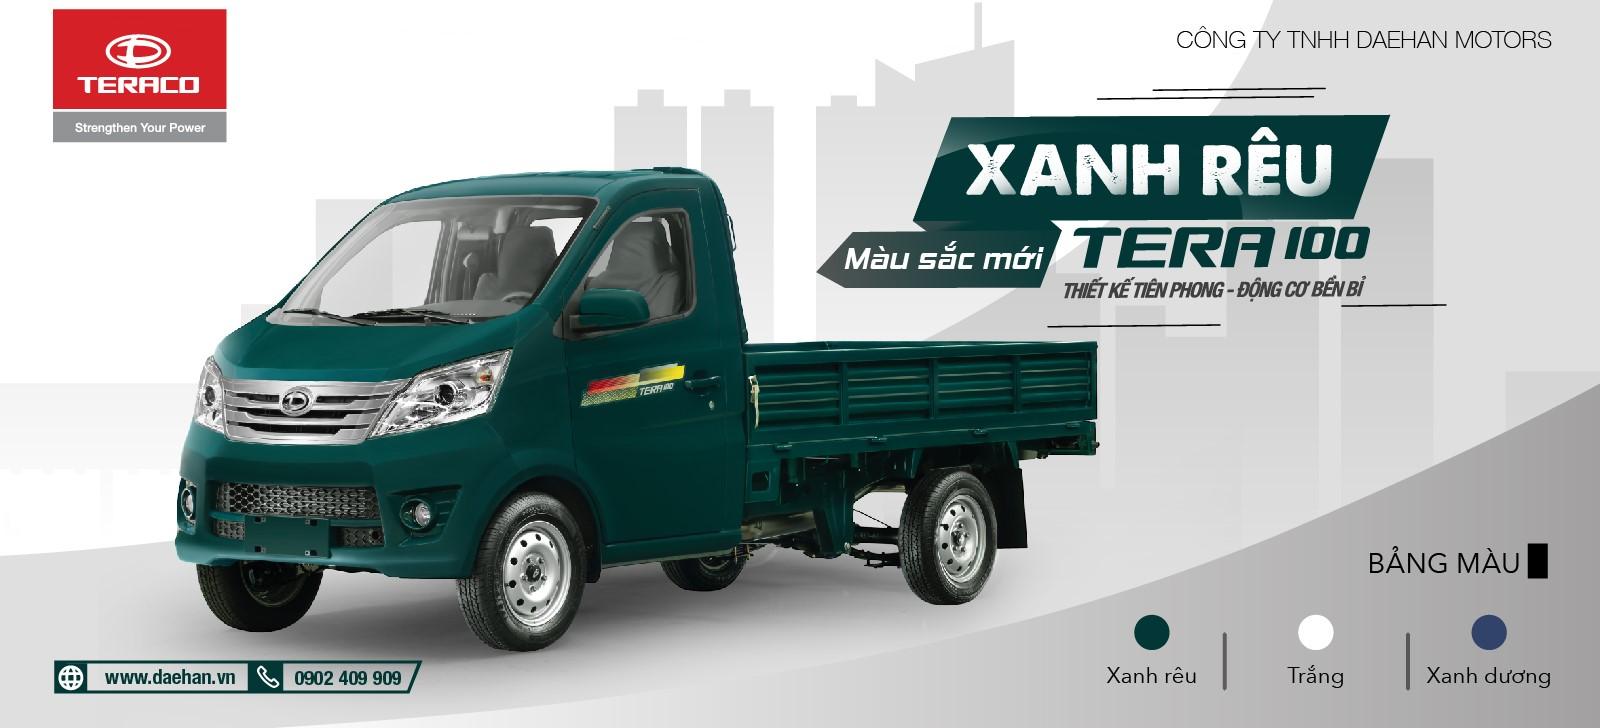 xe-t100-xanh-reu-daehan-motors